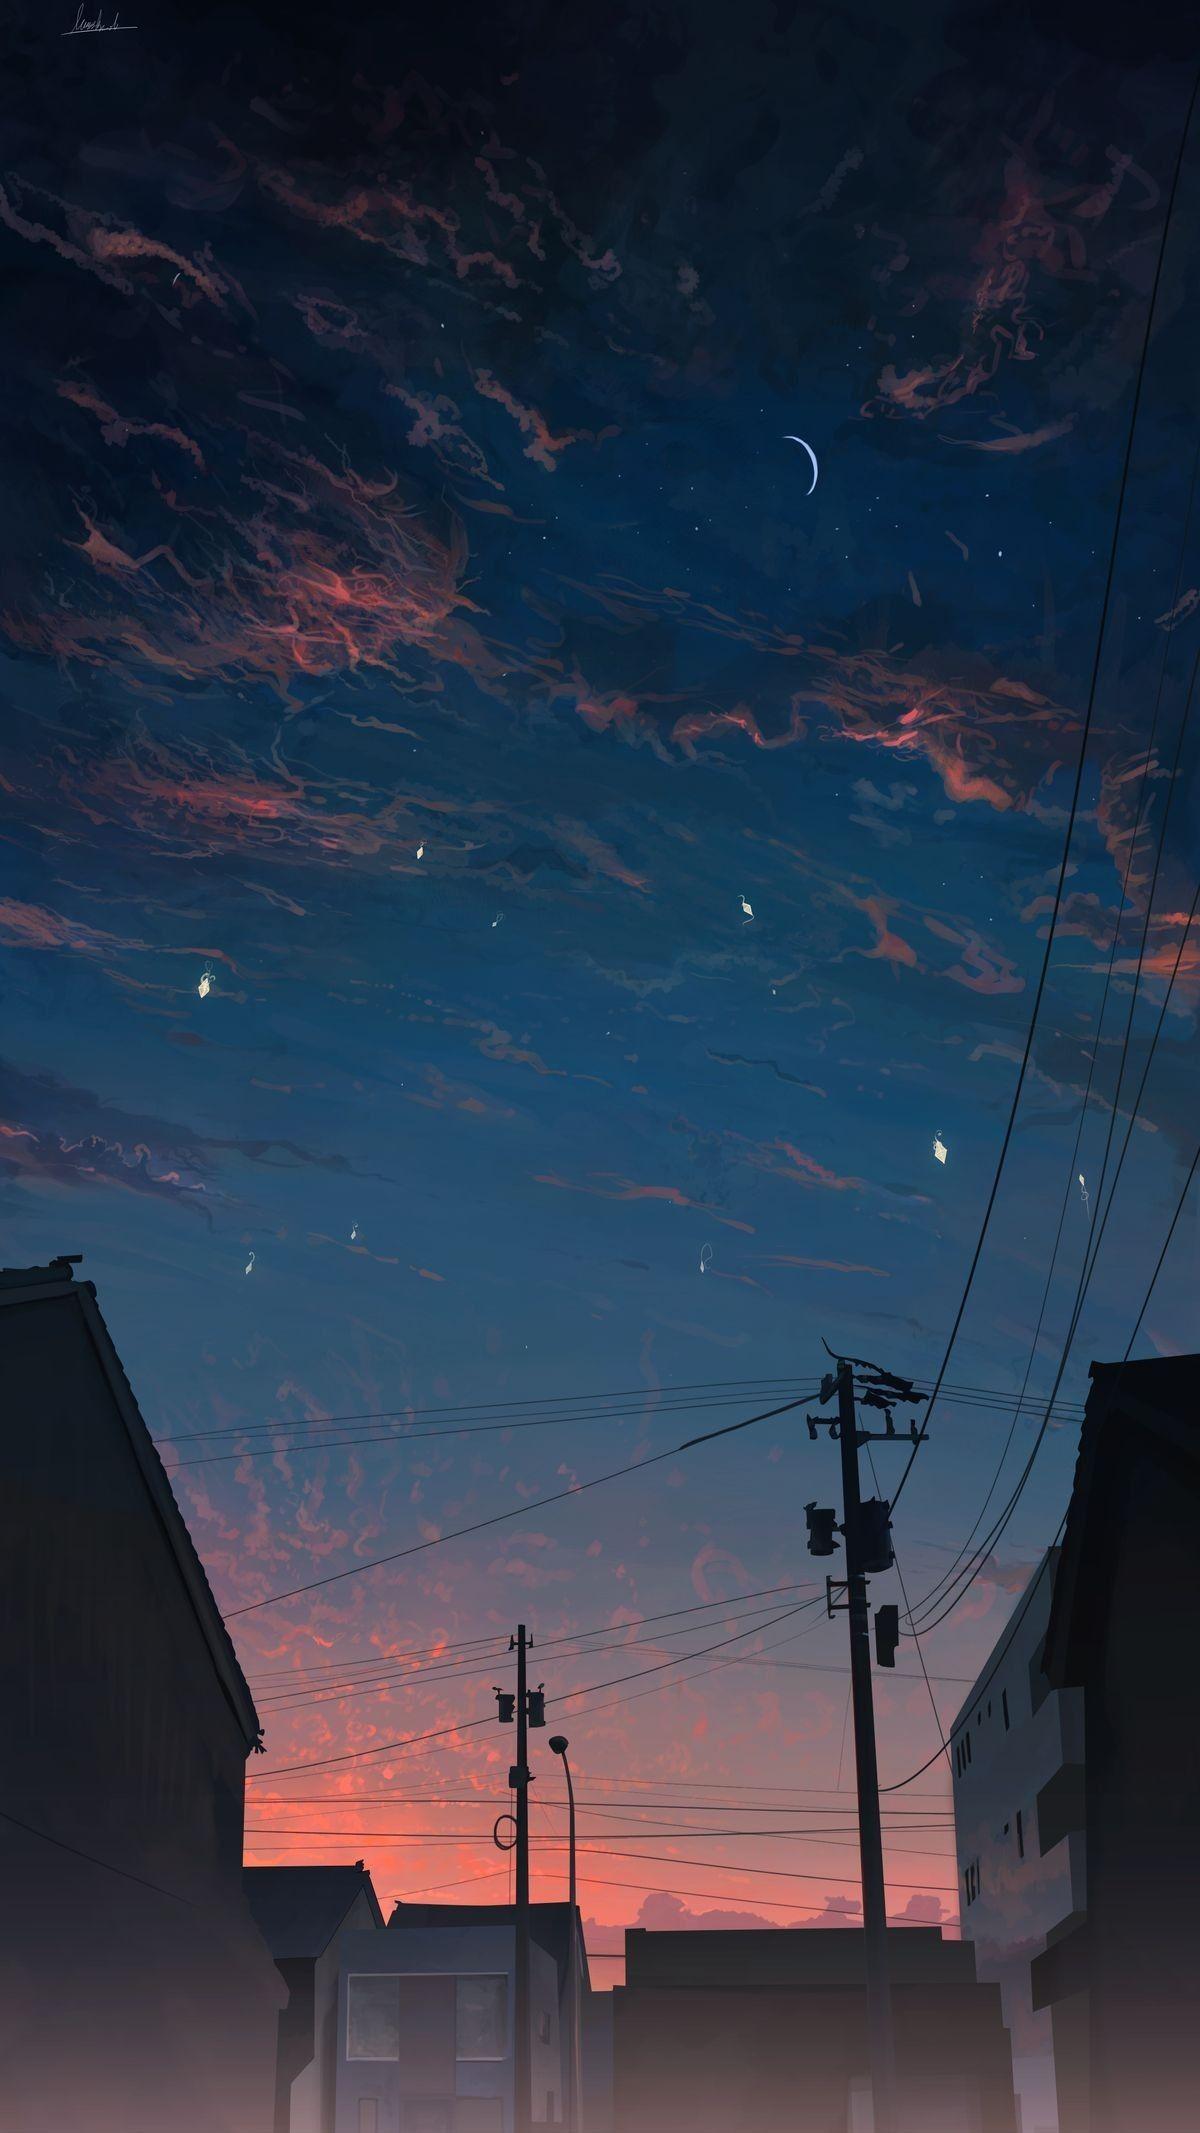 Anime Sky Wallpapers View Sunset Backgrounds Kurdishotaku Pemandangan Anime Pemandangan Khayalan Fotografi Alam Aesthetic anime clouds wallpaper